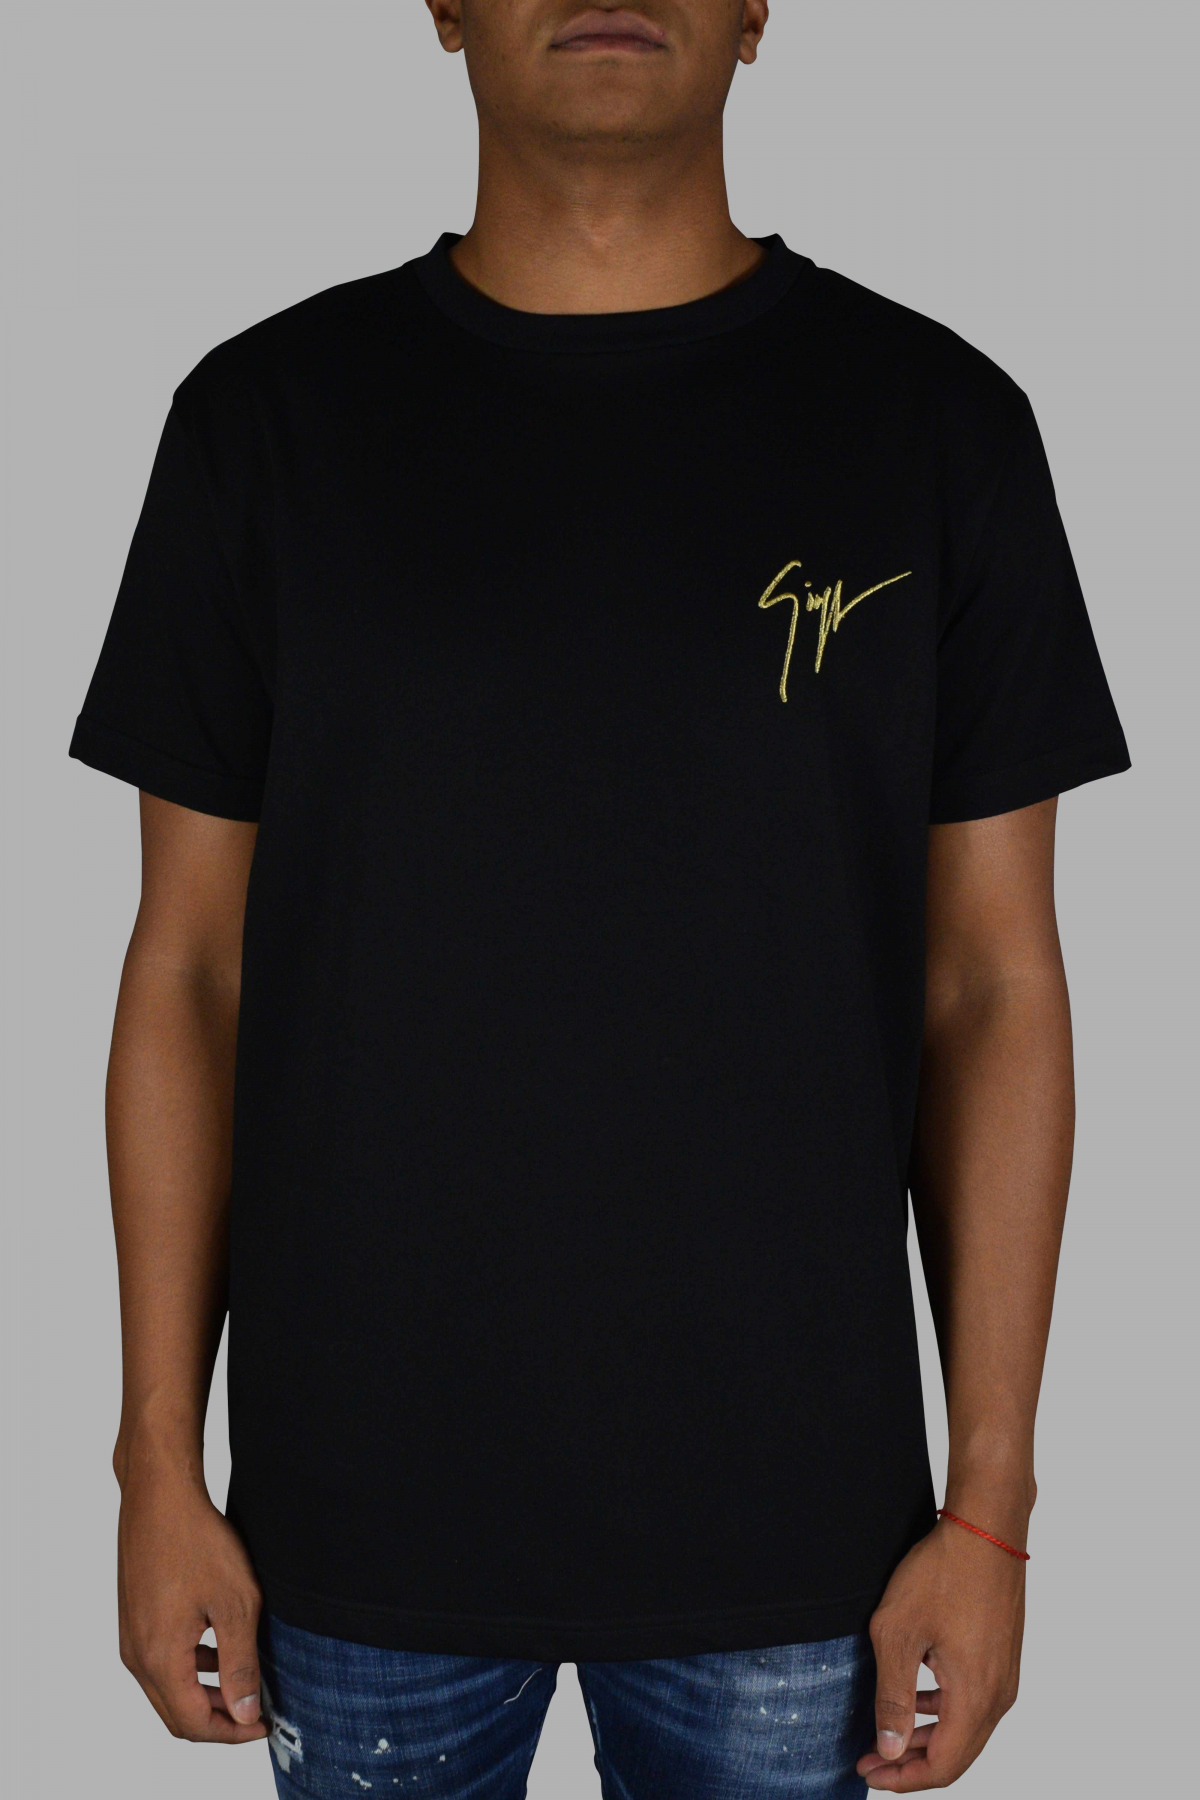 Giuseppe Zanotti T-Shirt black.